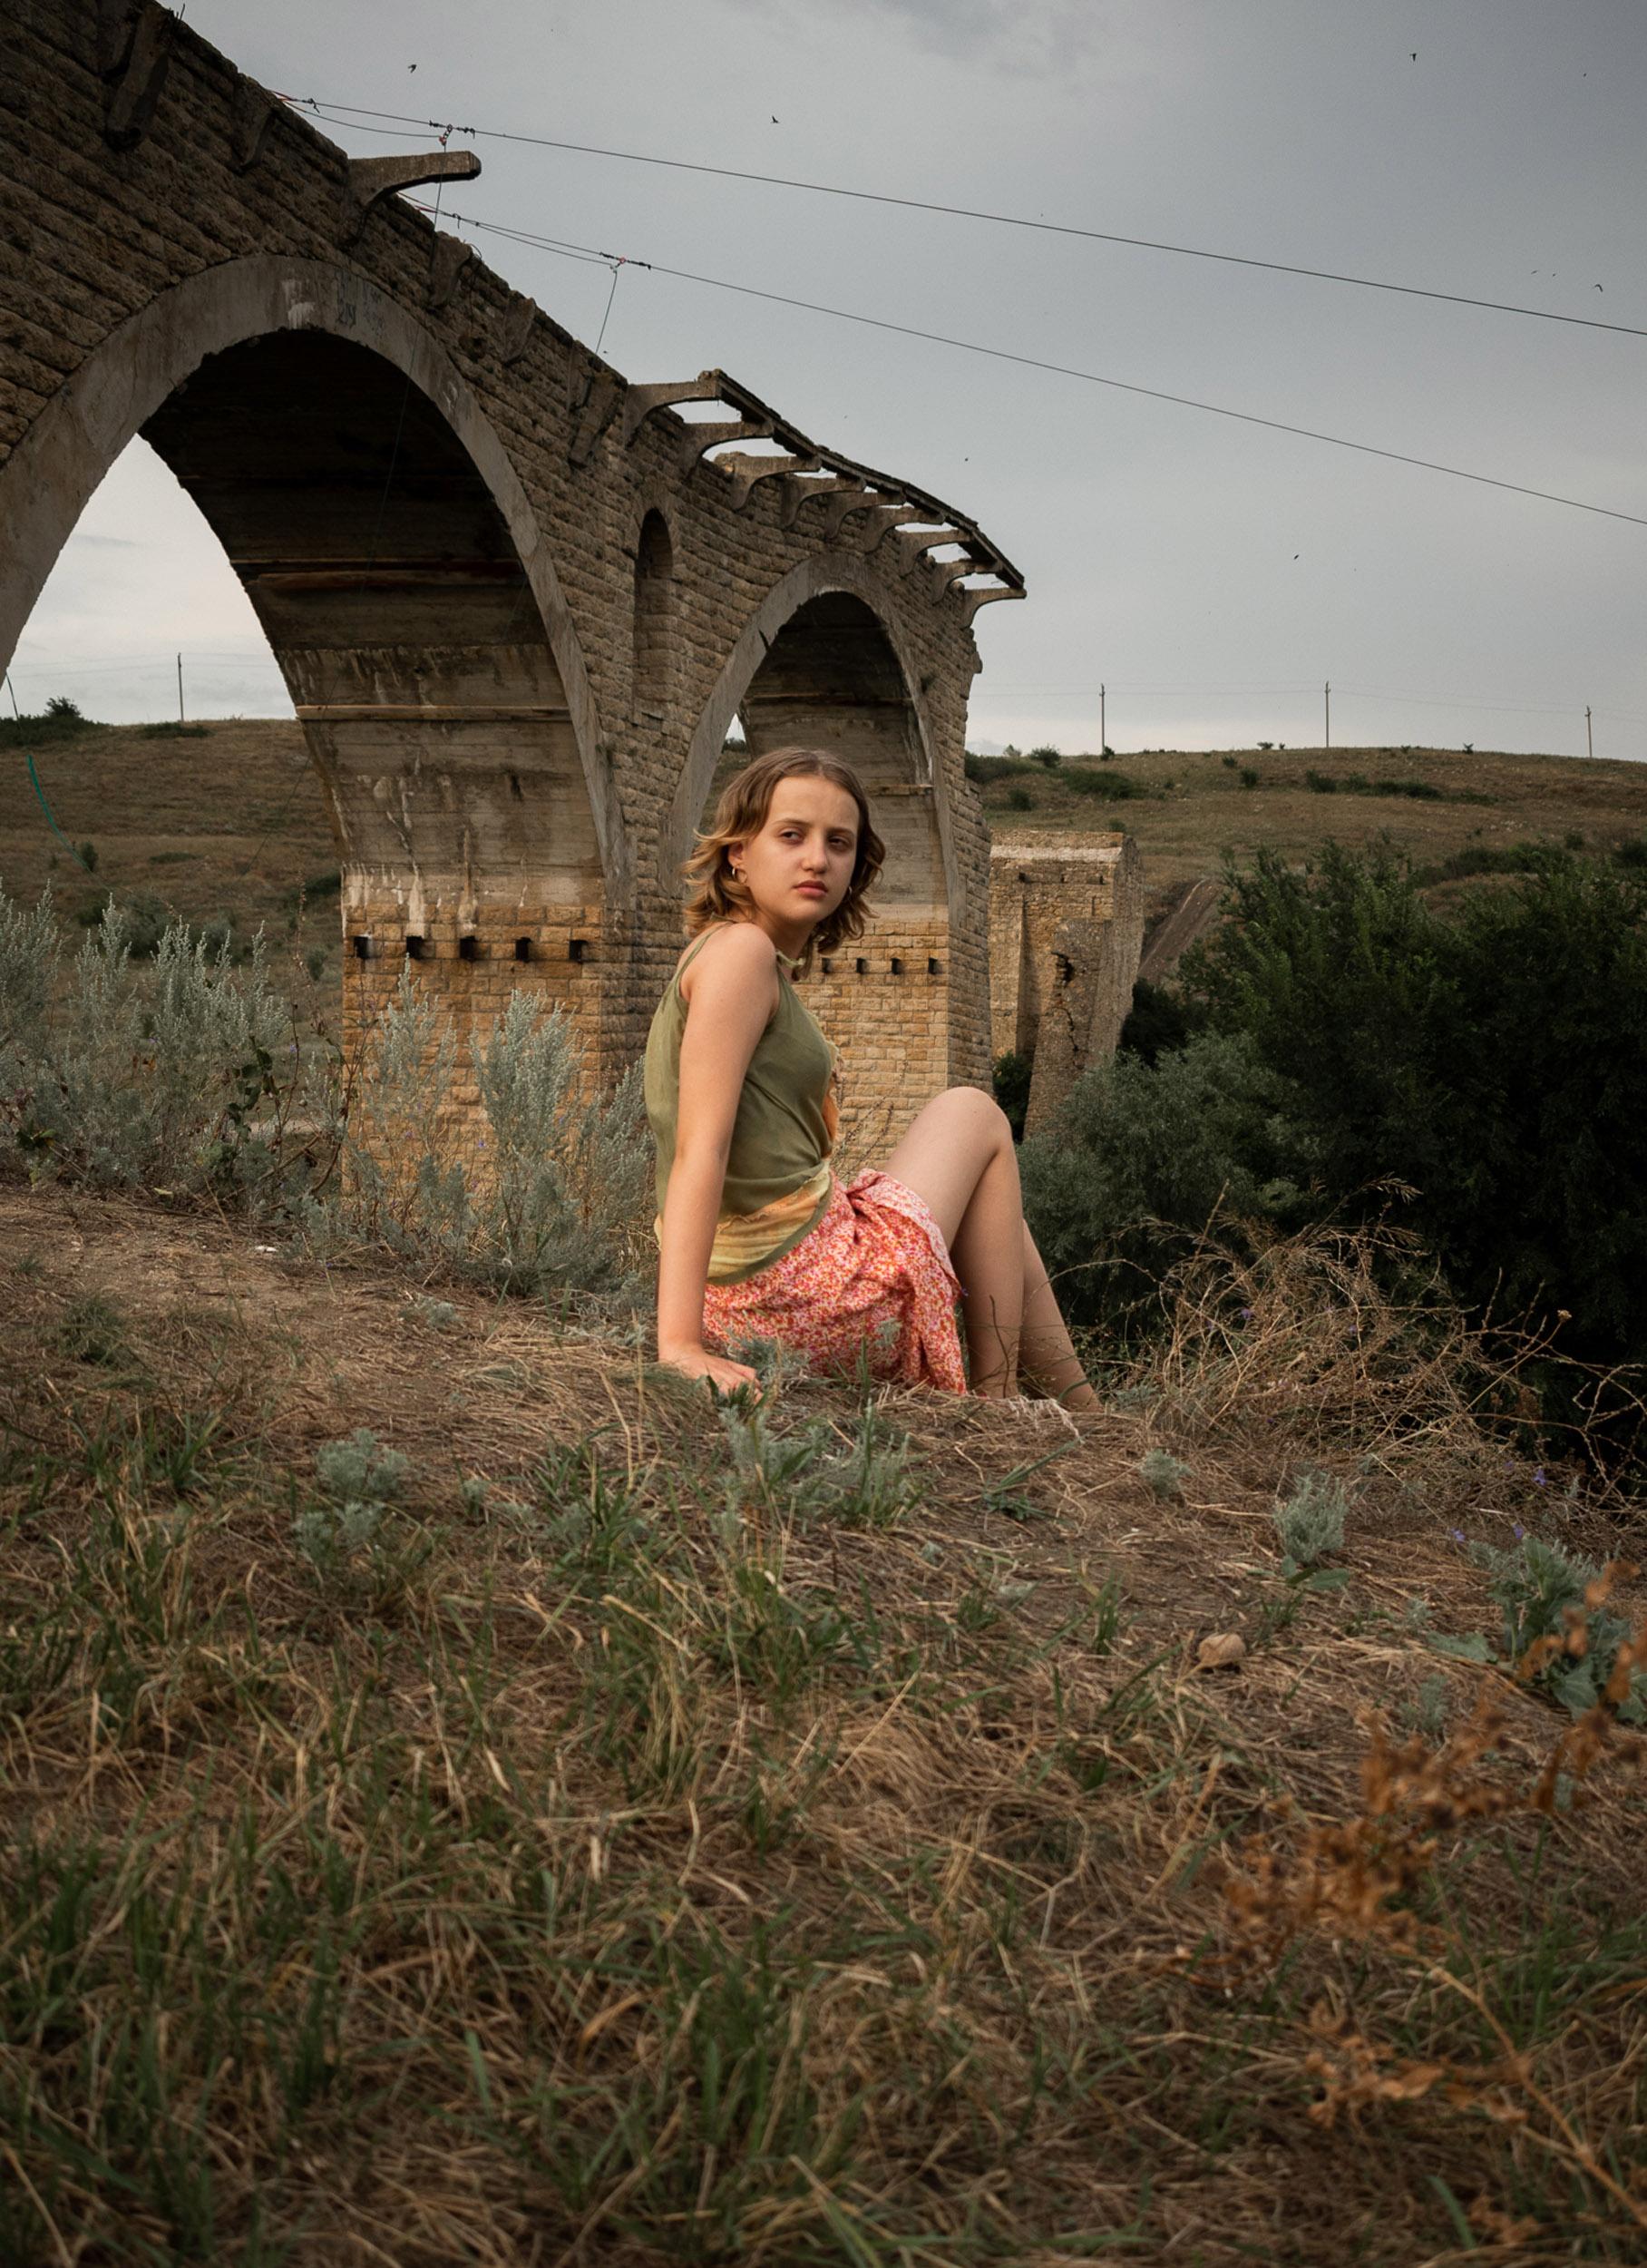 Categorie: Portrait, Glamour, Landscape & Nature - Photographer: Асеева Наталья - Location: Краснодарский край, Russia